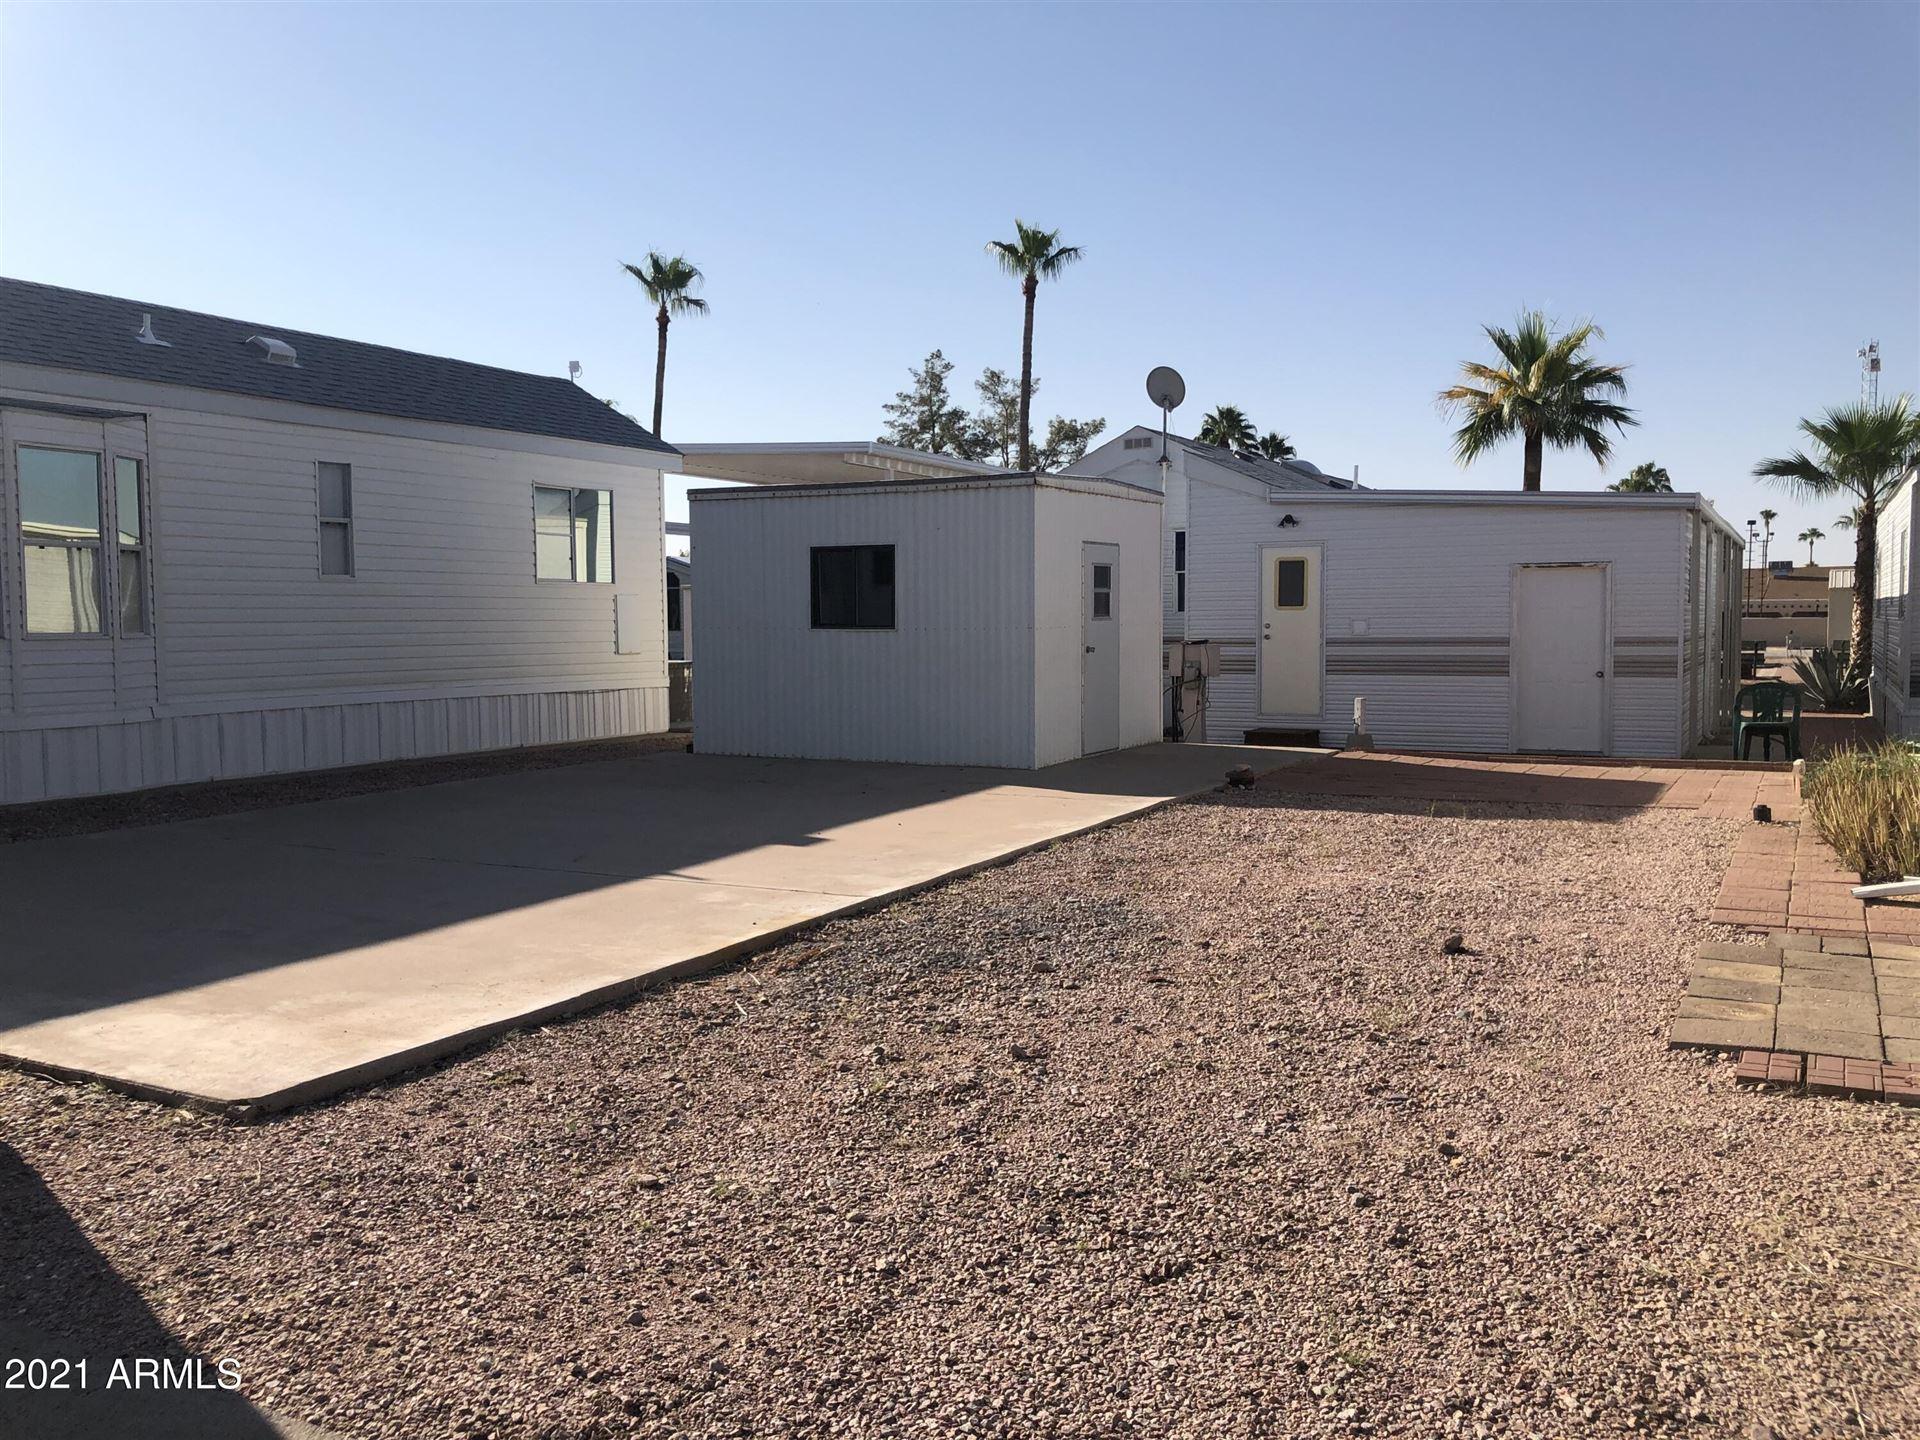 Photo of 319 S EMERALD Drive, Apache Junction, AZ 85120 (MLS # 6292832)